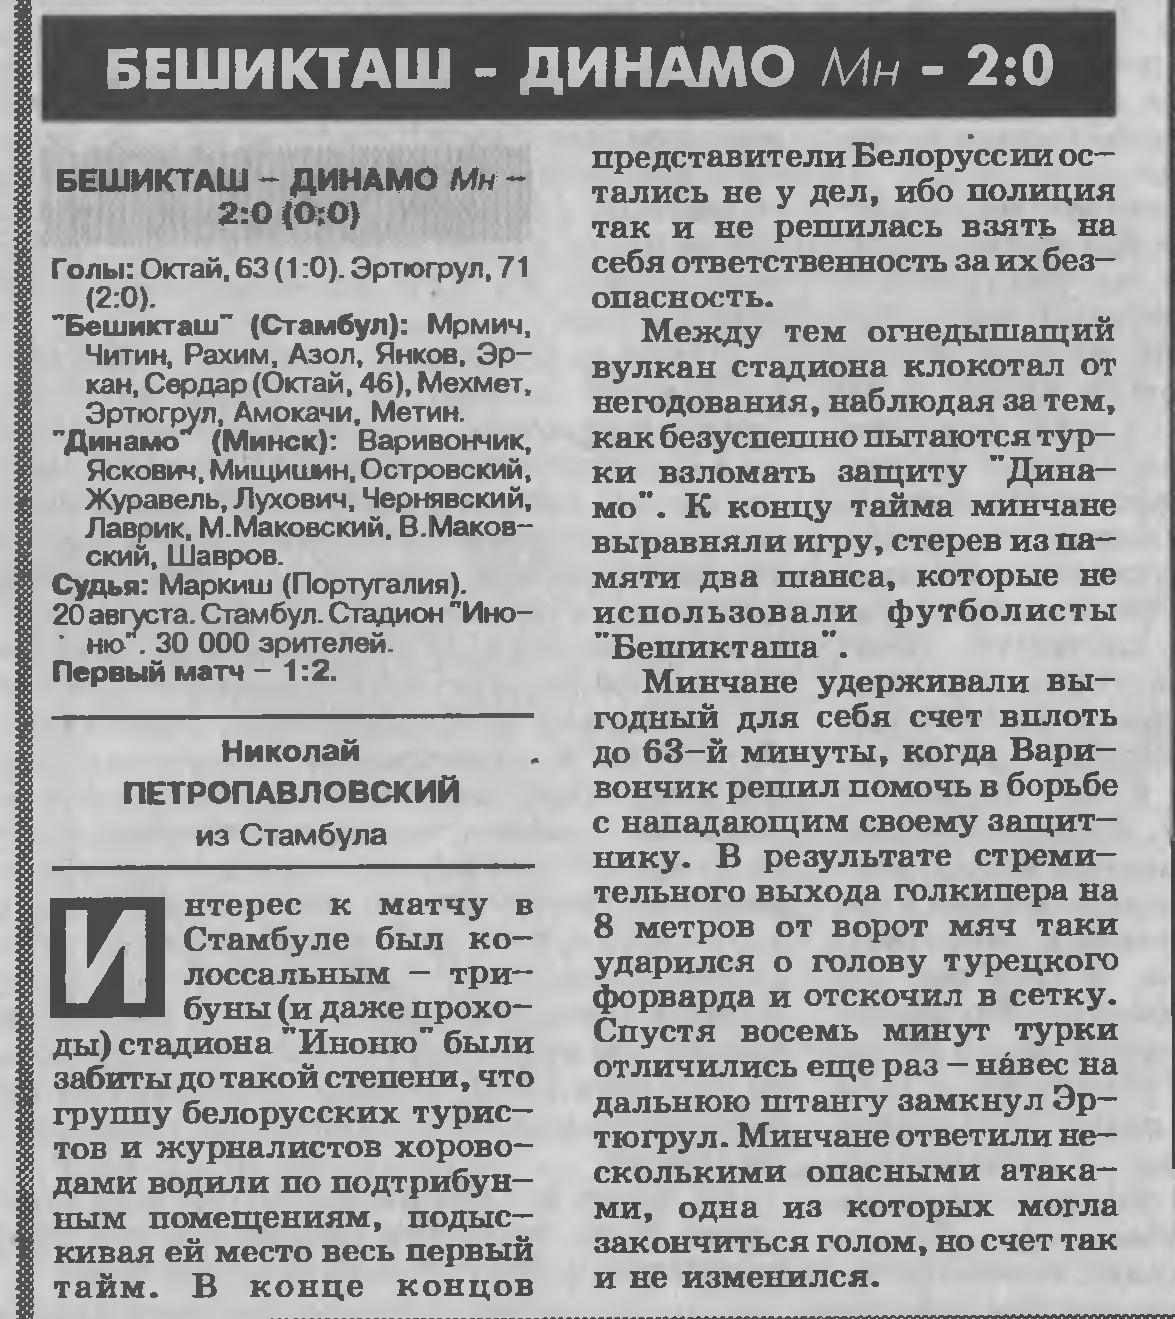 Бешикташ (Турция) - Динамо Минск (Белоруссия) 2:0